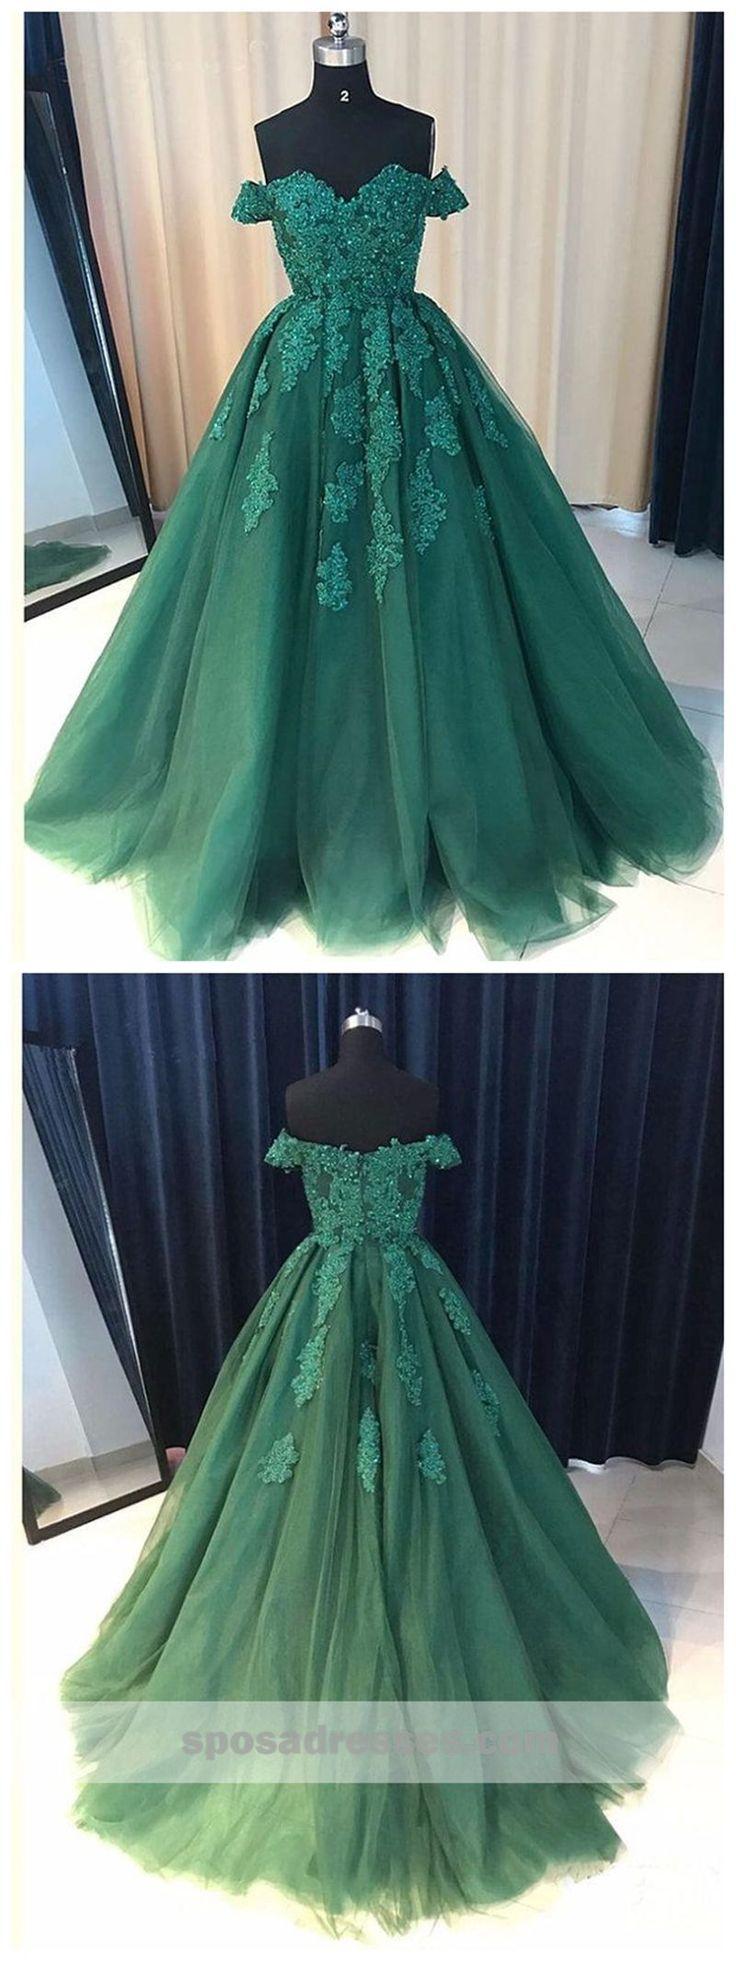 Off Shoulder Emerald Green Lace A line Long Custom Evening Prom Dresses, 17428 #longpromdresses